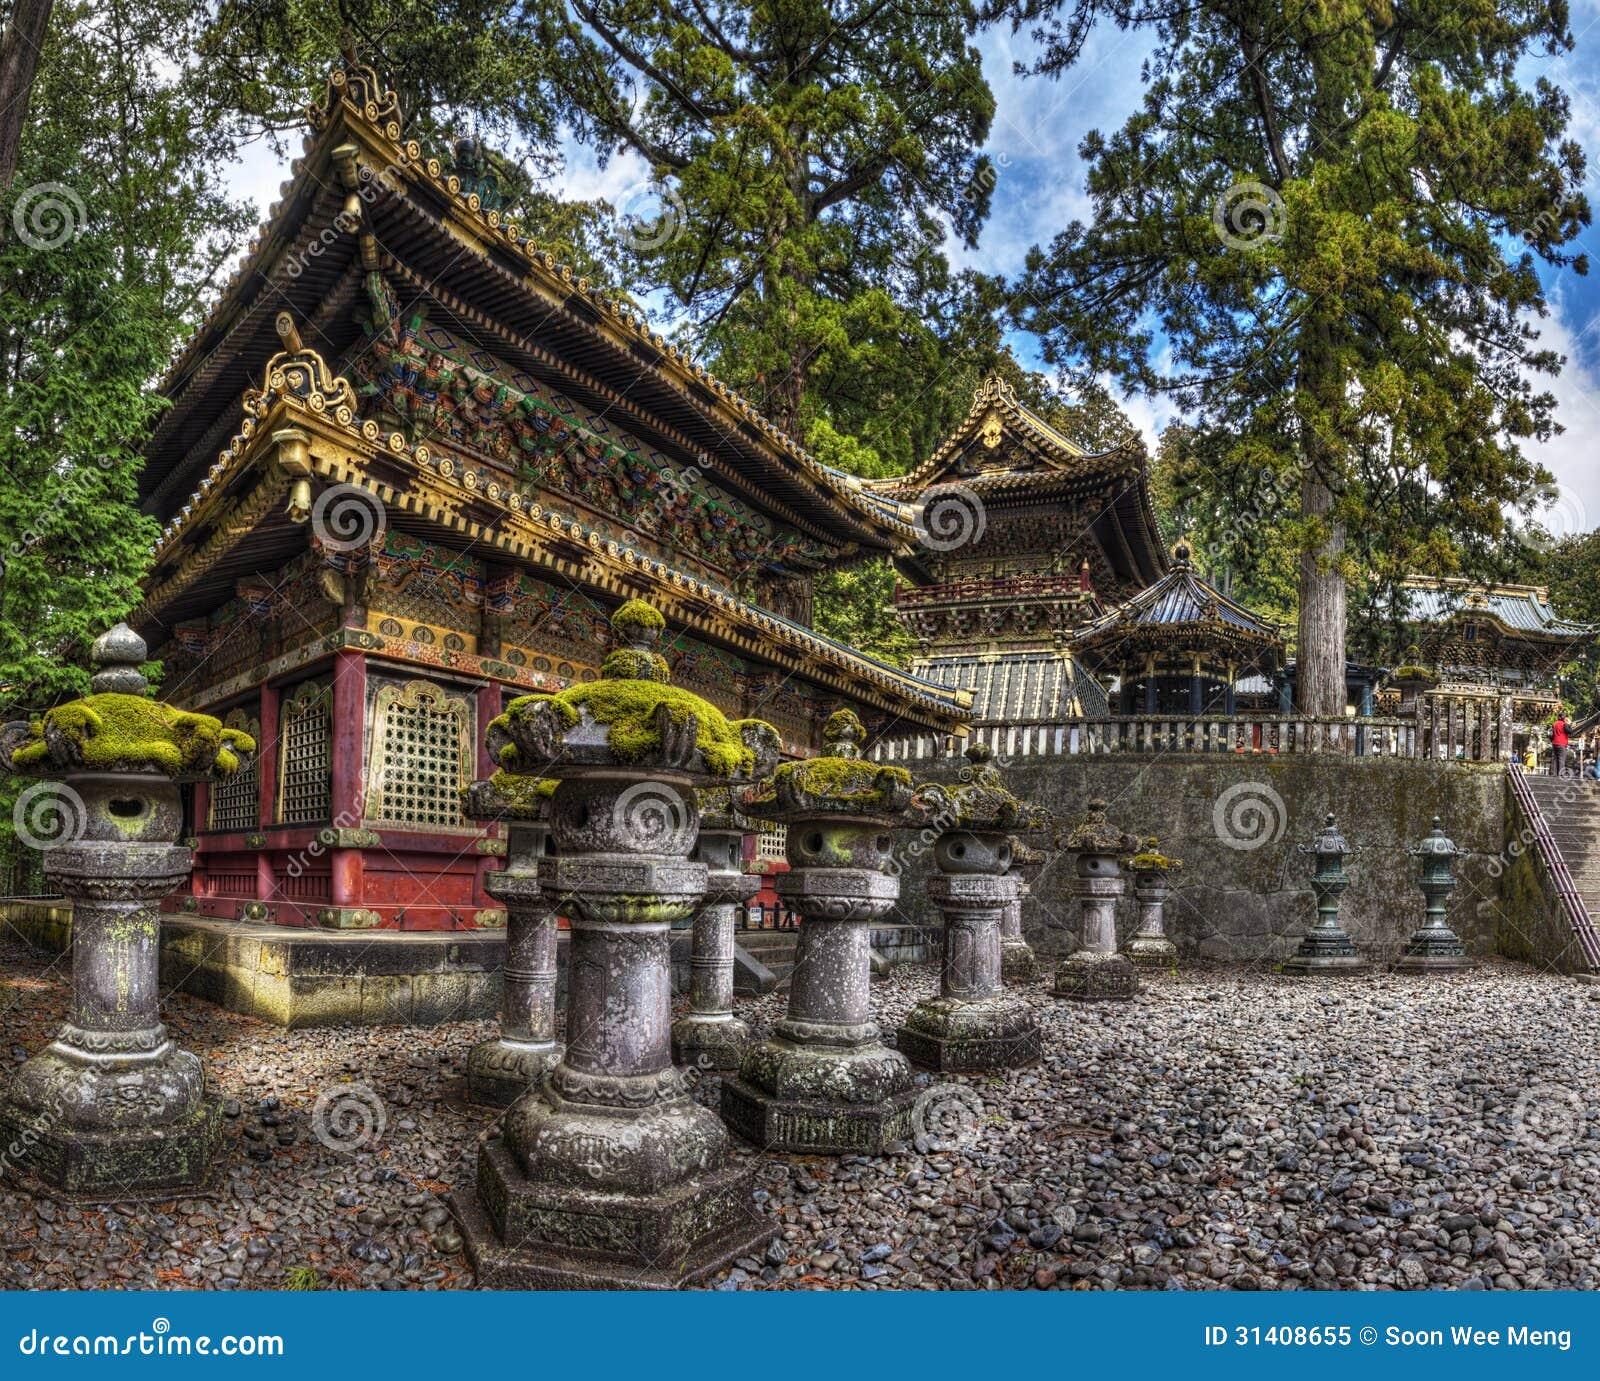 The Rinzo And Drum Tower Of Toshogu Shrine, Nikko Japan Royalty Free Stock Ph...